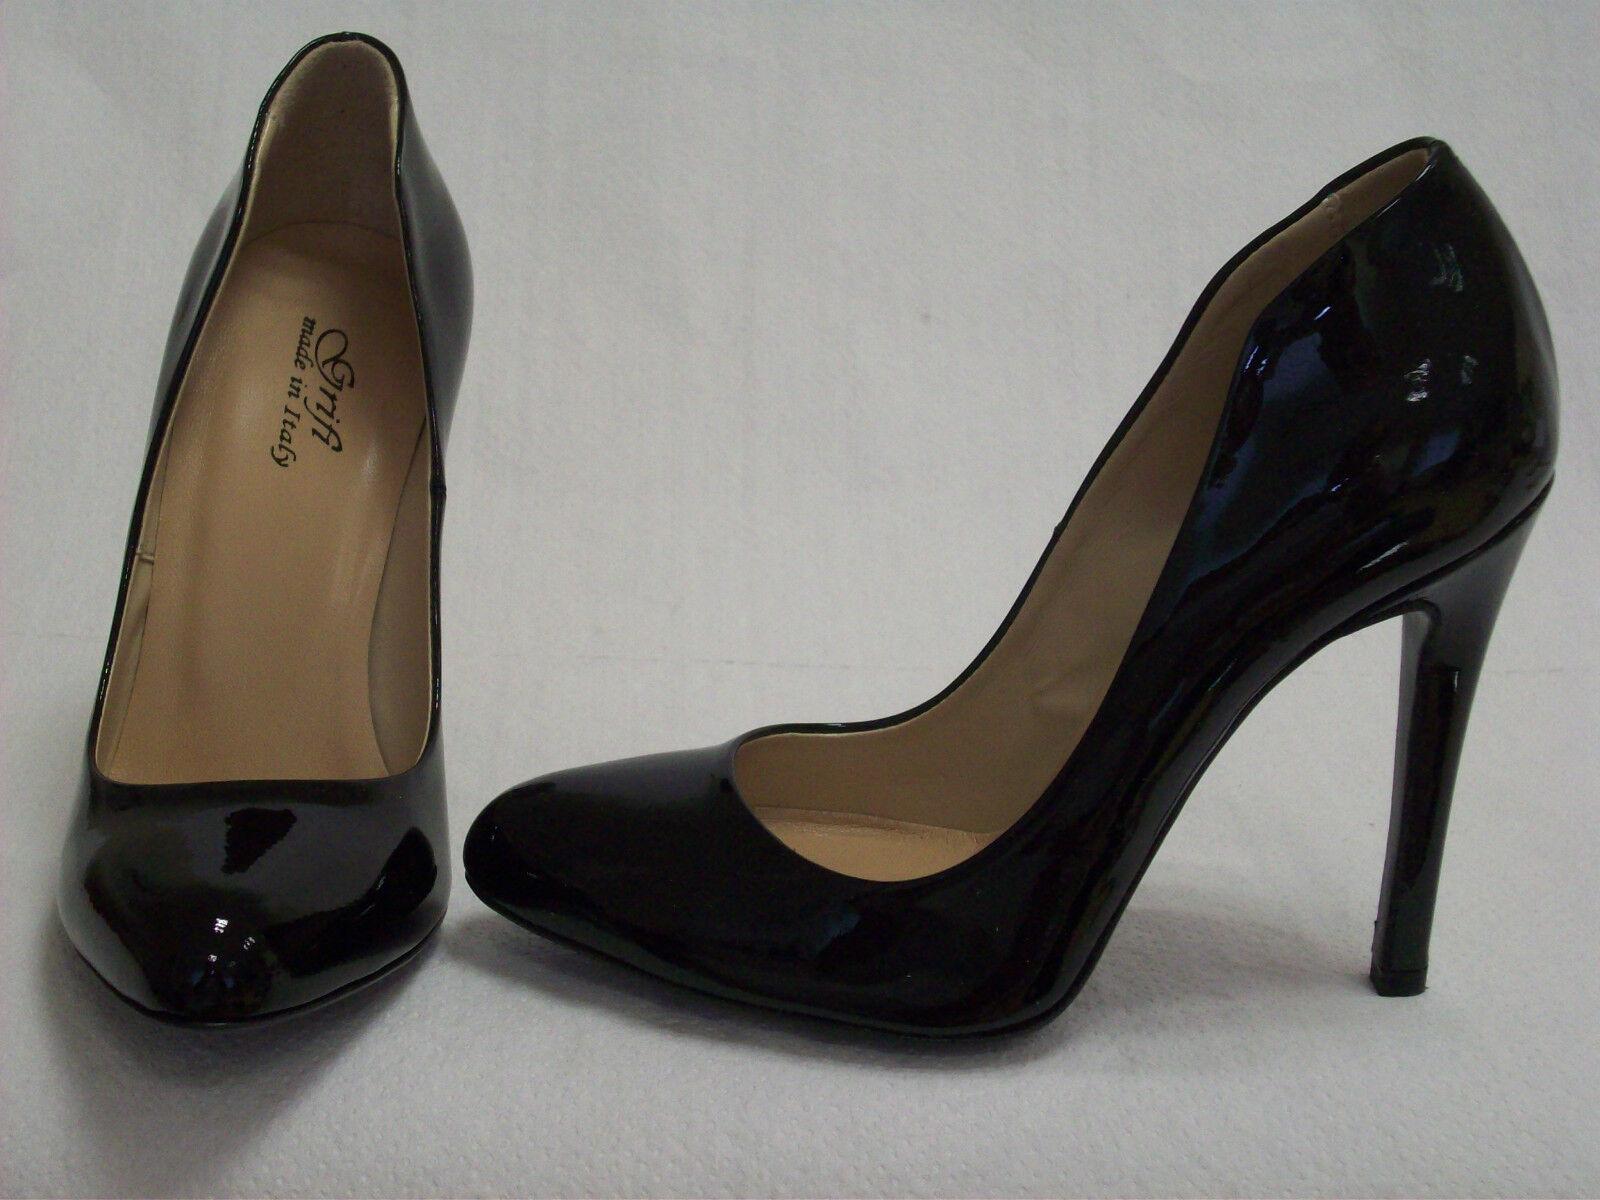 NEU,Grifi, Größe High Heel Pumps, schwarz, Größe NEU,Grifi, 35, Absatz ca.11 cm,Originalkarton 3ef919